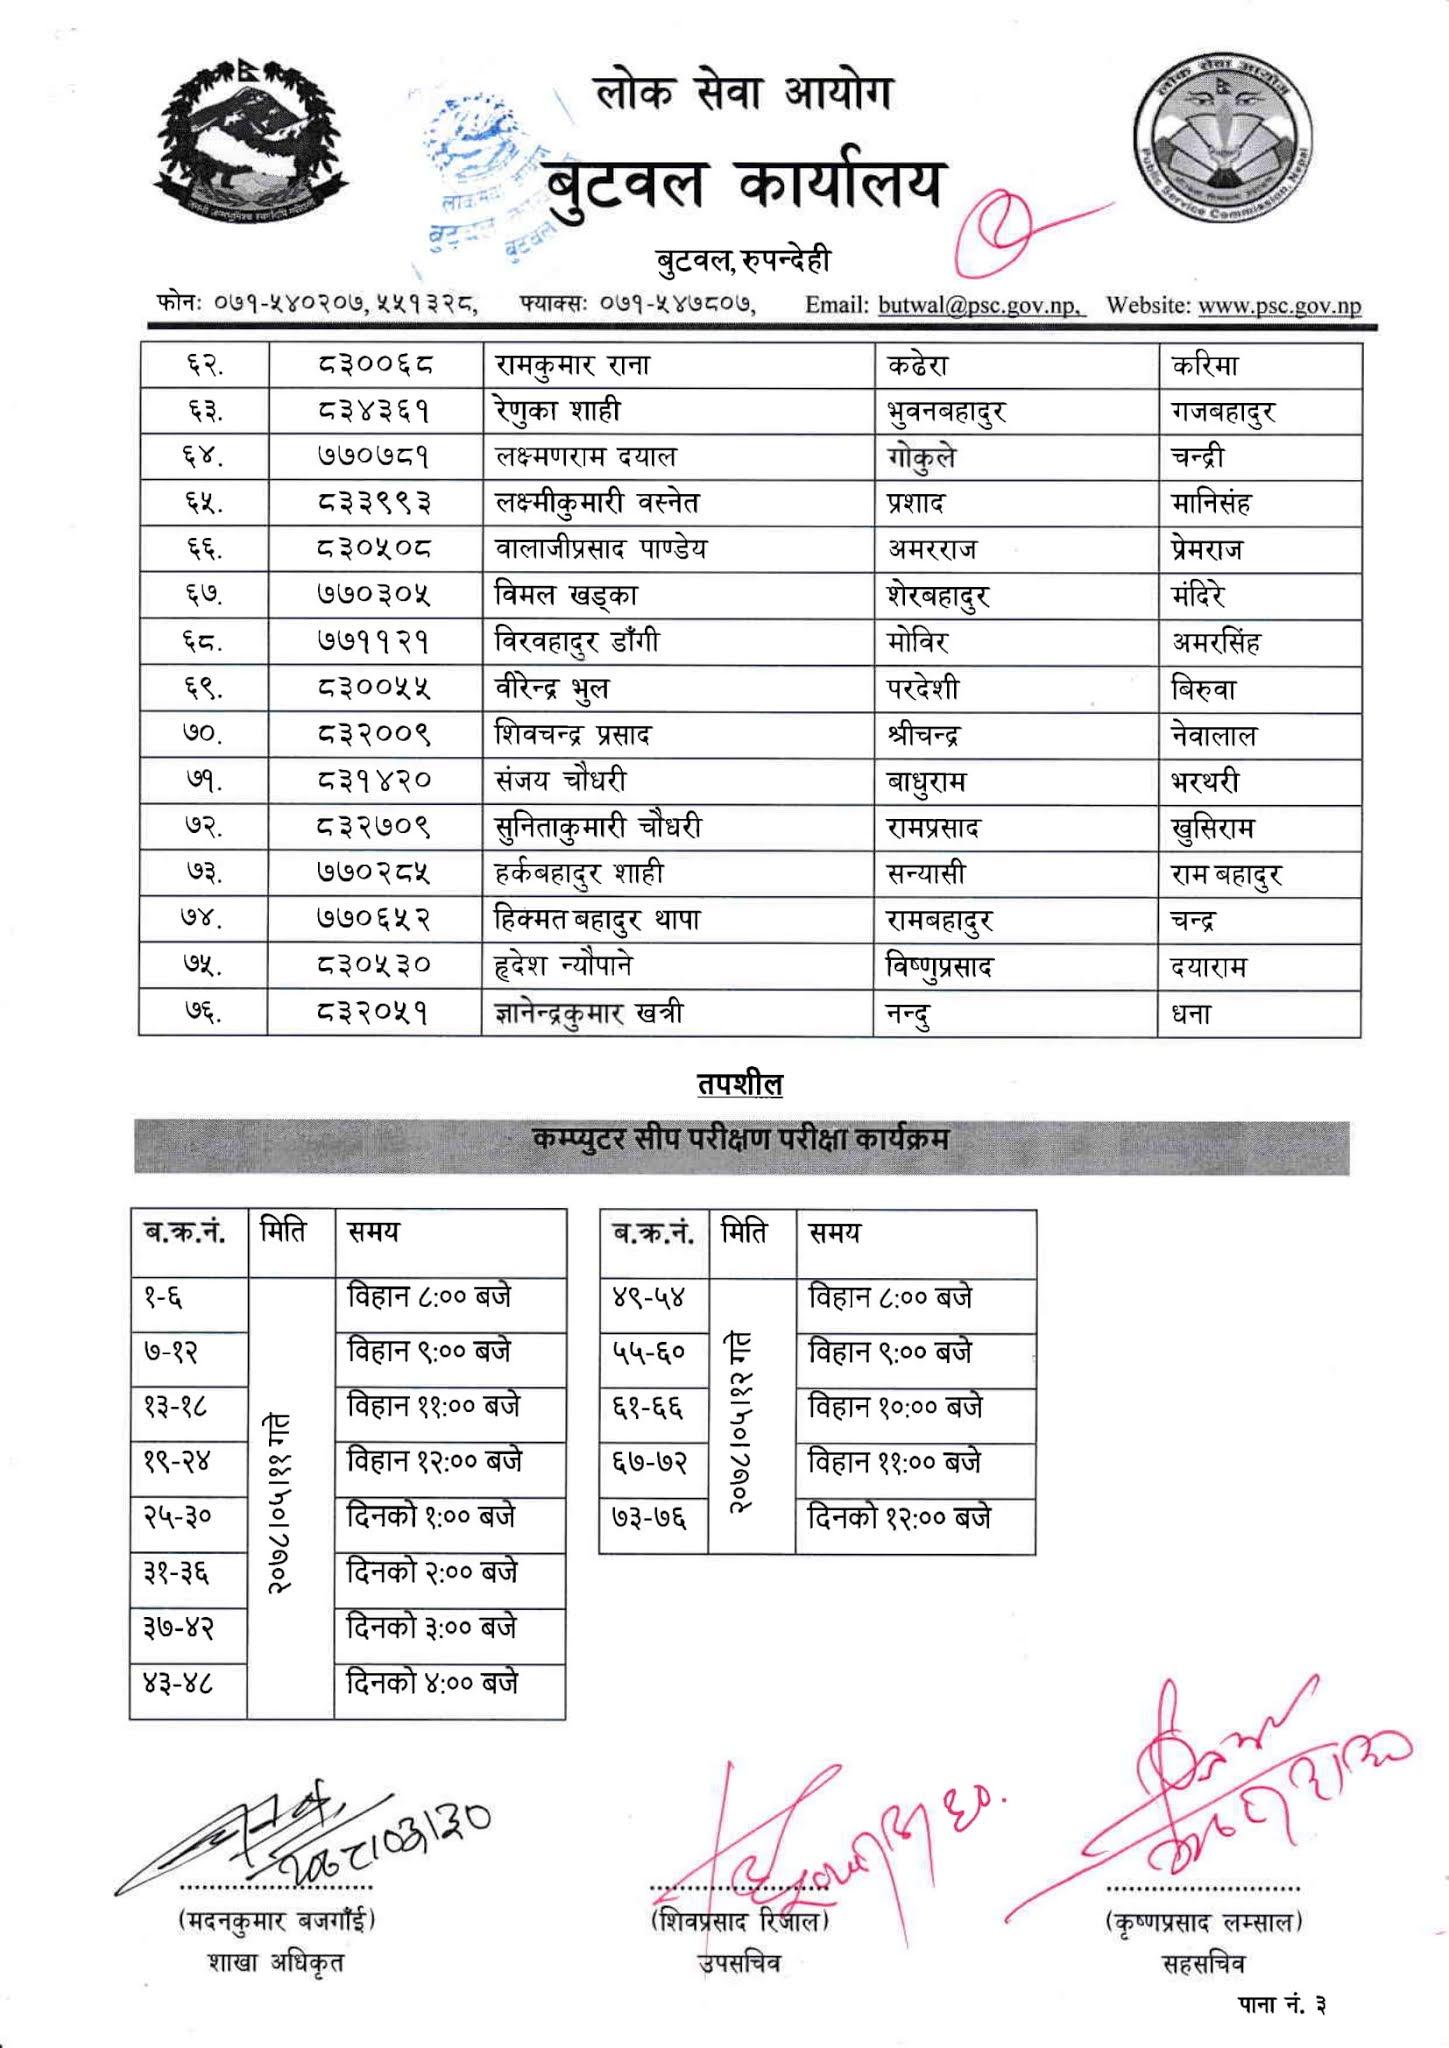 NASU - Dipayal Lok Sewa Aayog Written Exam Result & Exam Schedule